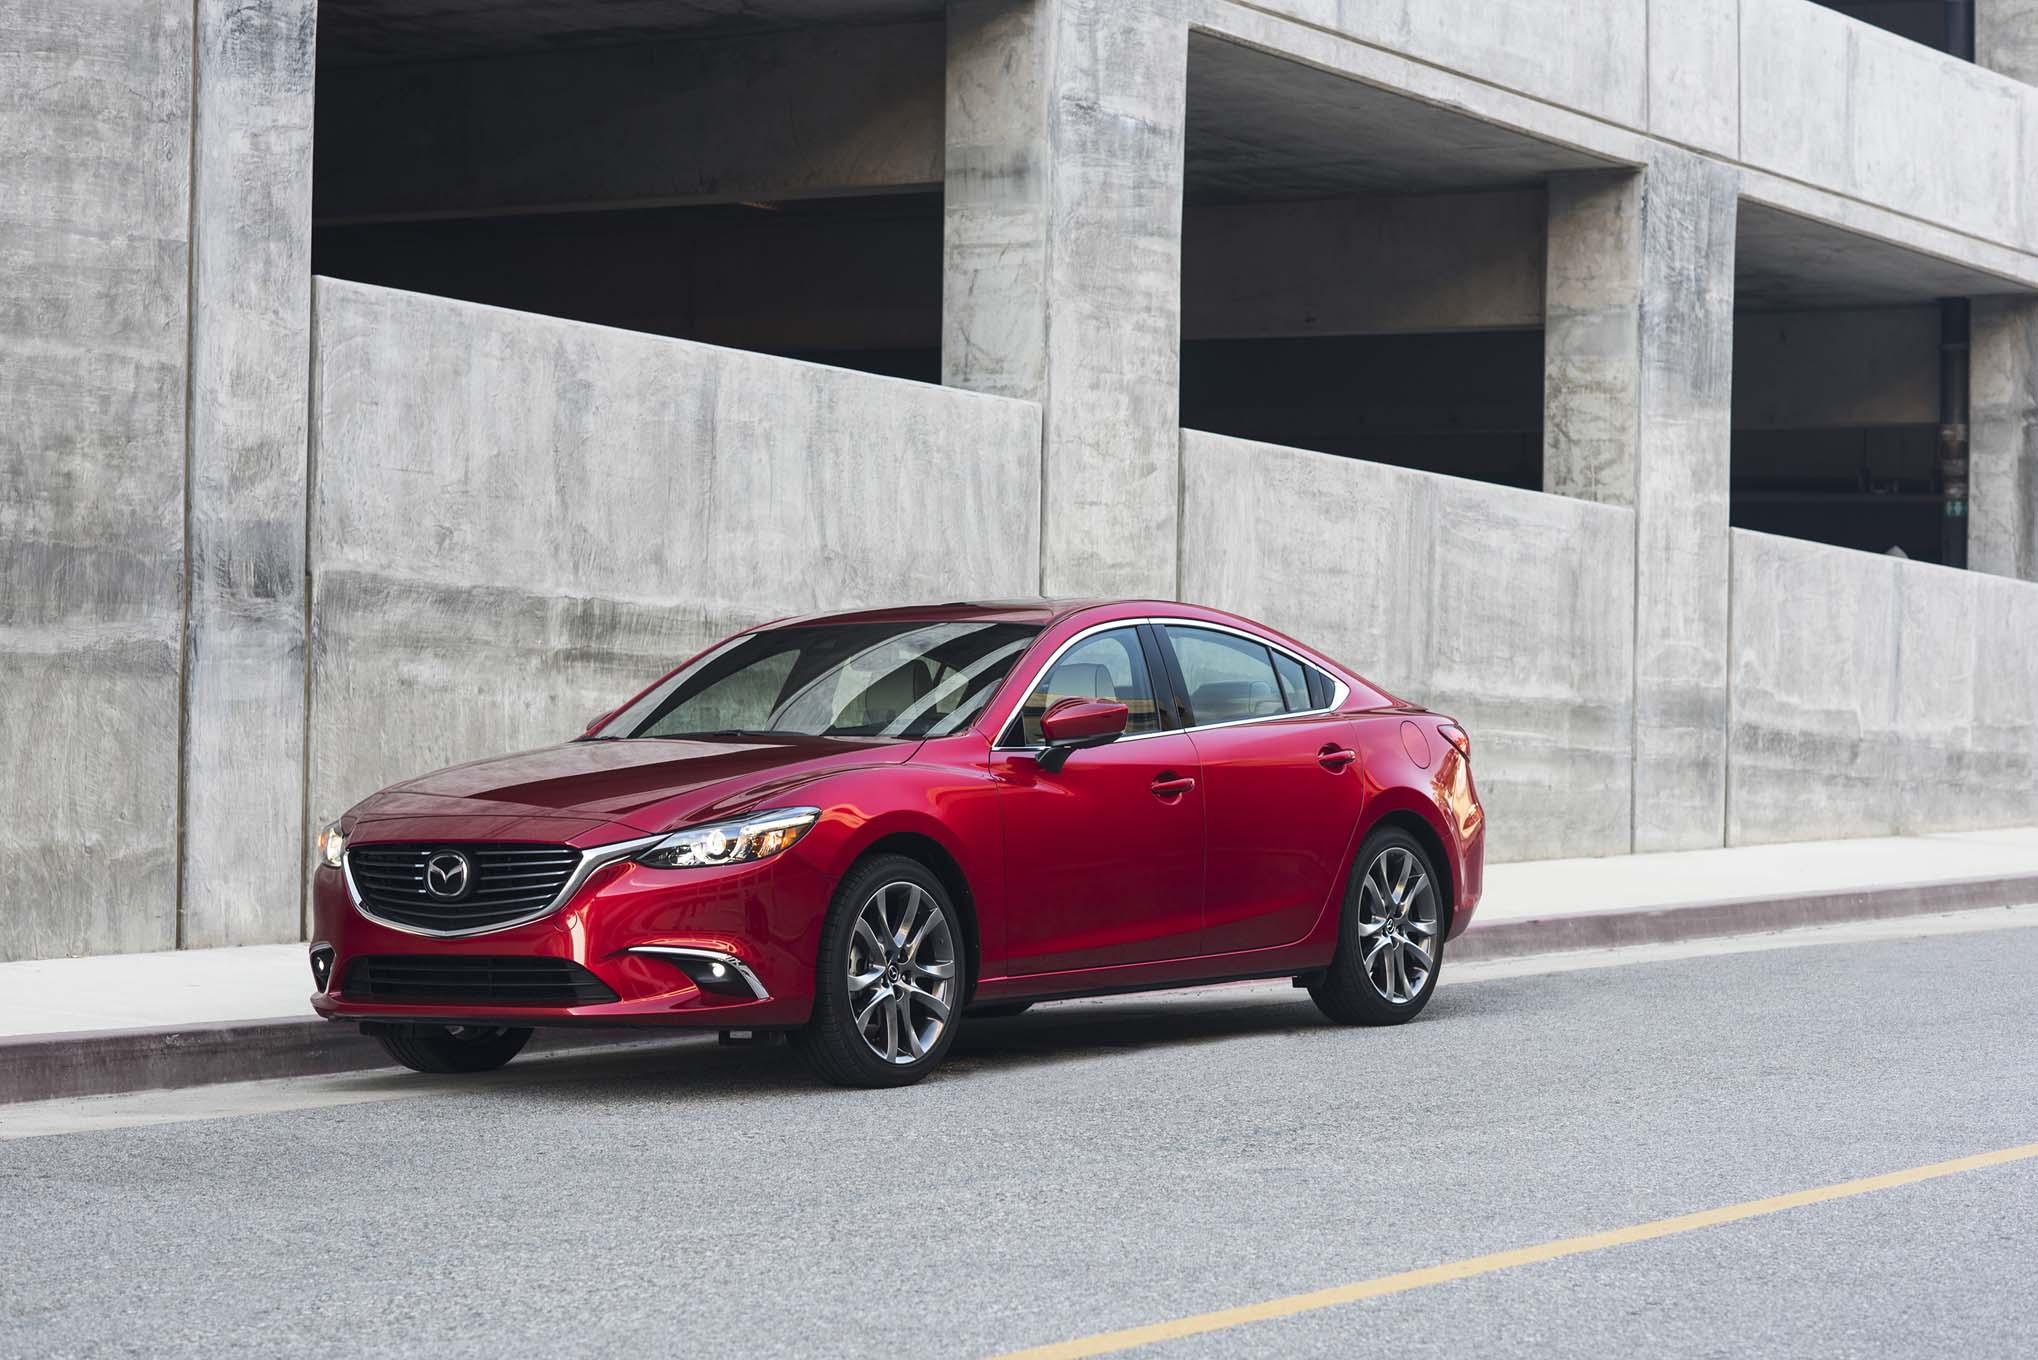 2017 Mazda6 Front Three Quarter 05 1